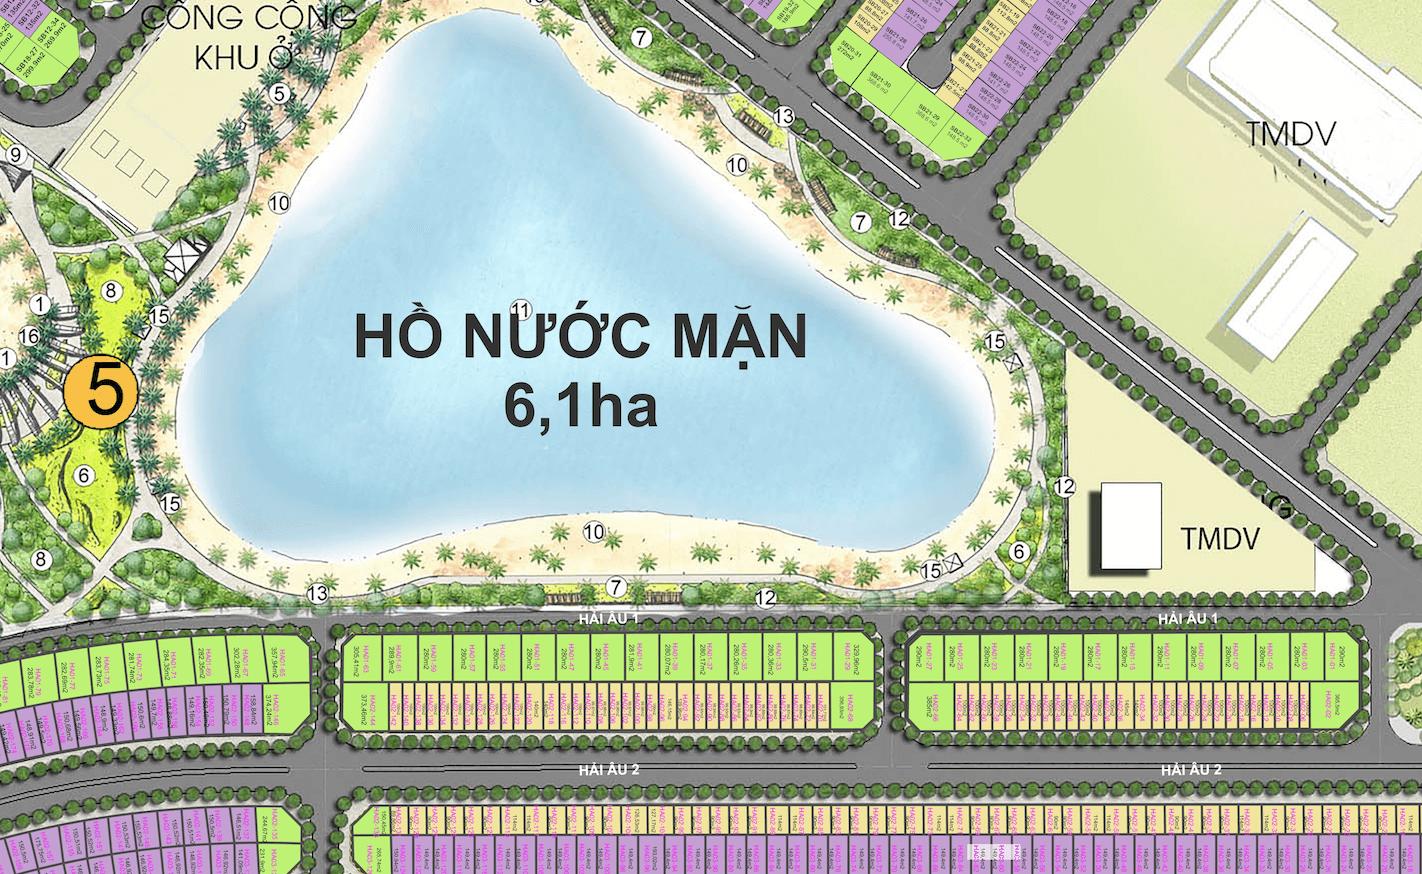 shophouse-lien-ke-hai-au-ha-02-vincity-ocean-park-gia-lam-tay-bac-02